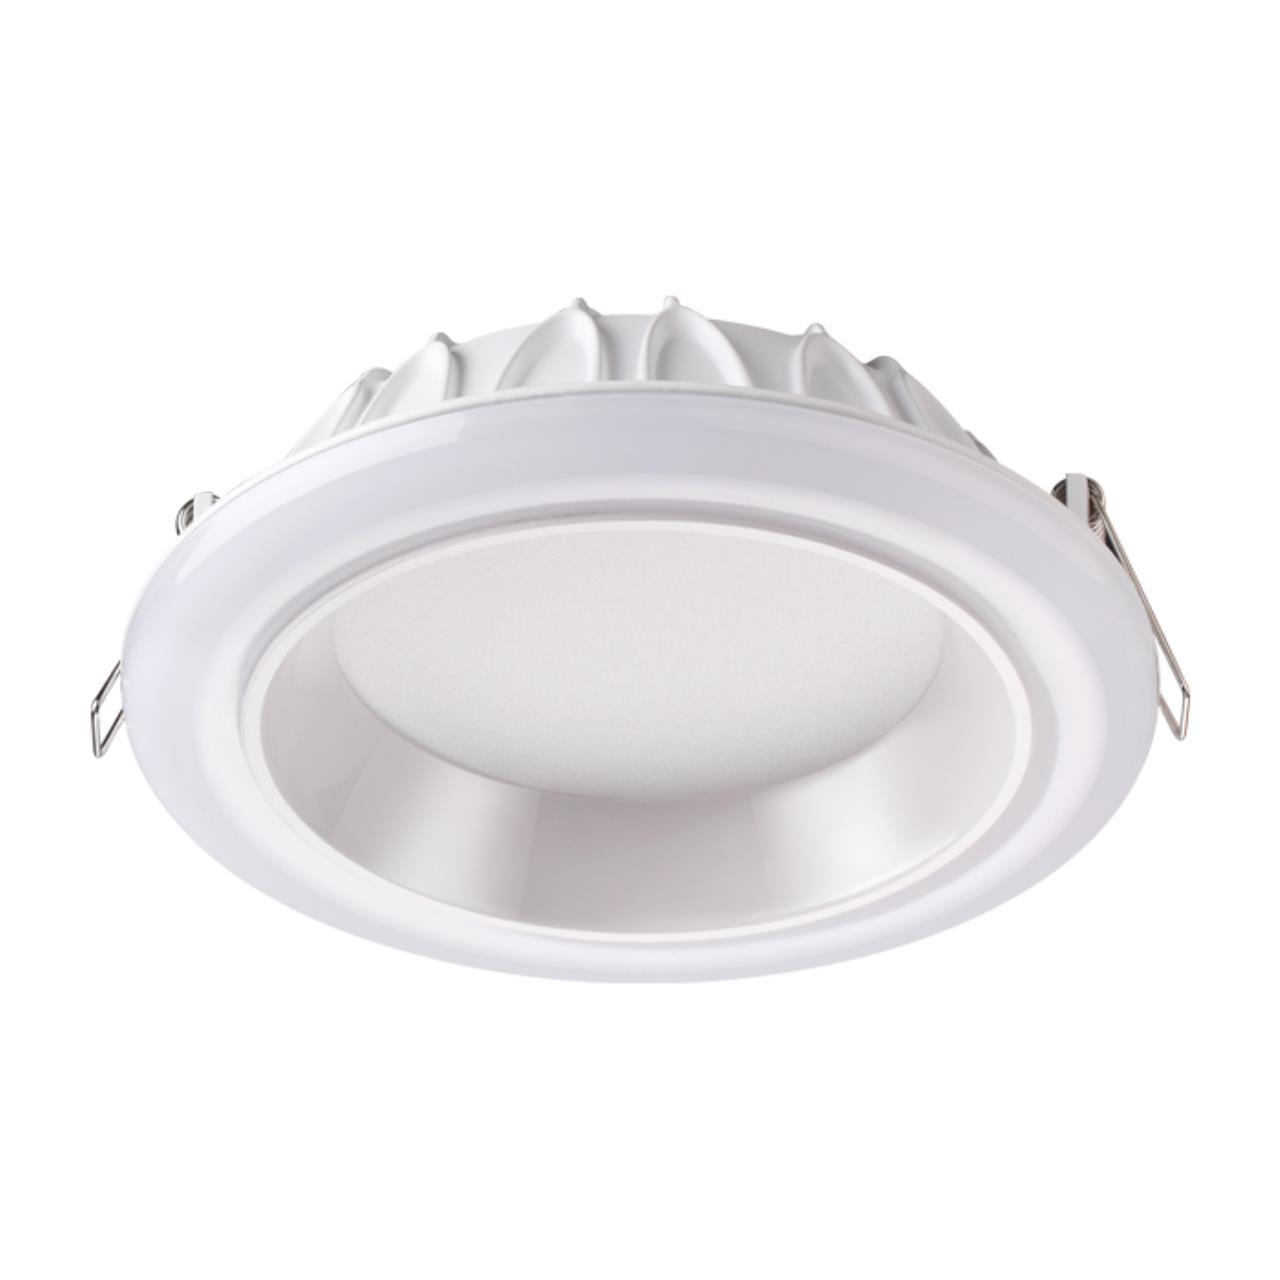 358280 SPOT NT19 000 белый Встраиваемый светильник IP20 LED 4000K 22W 85-265V JOIA